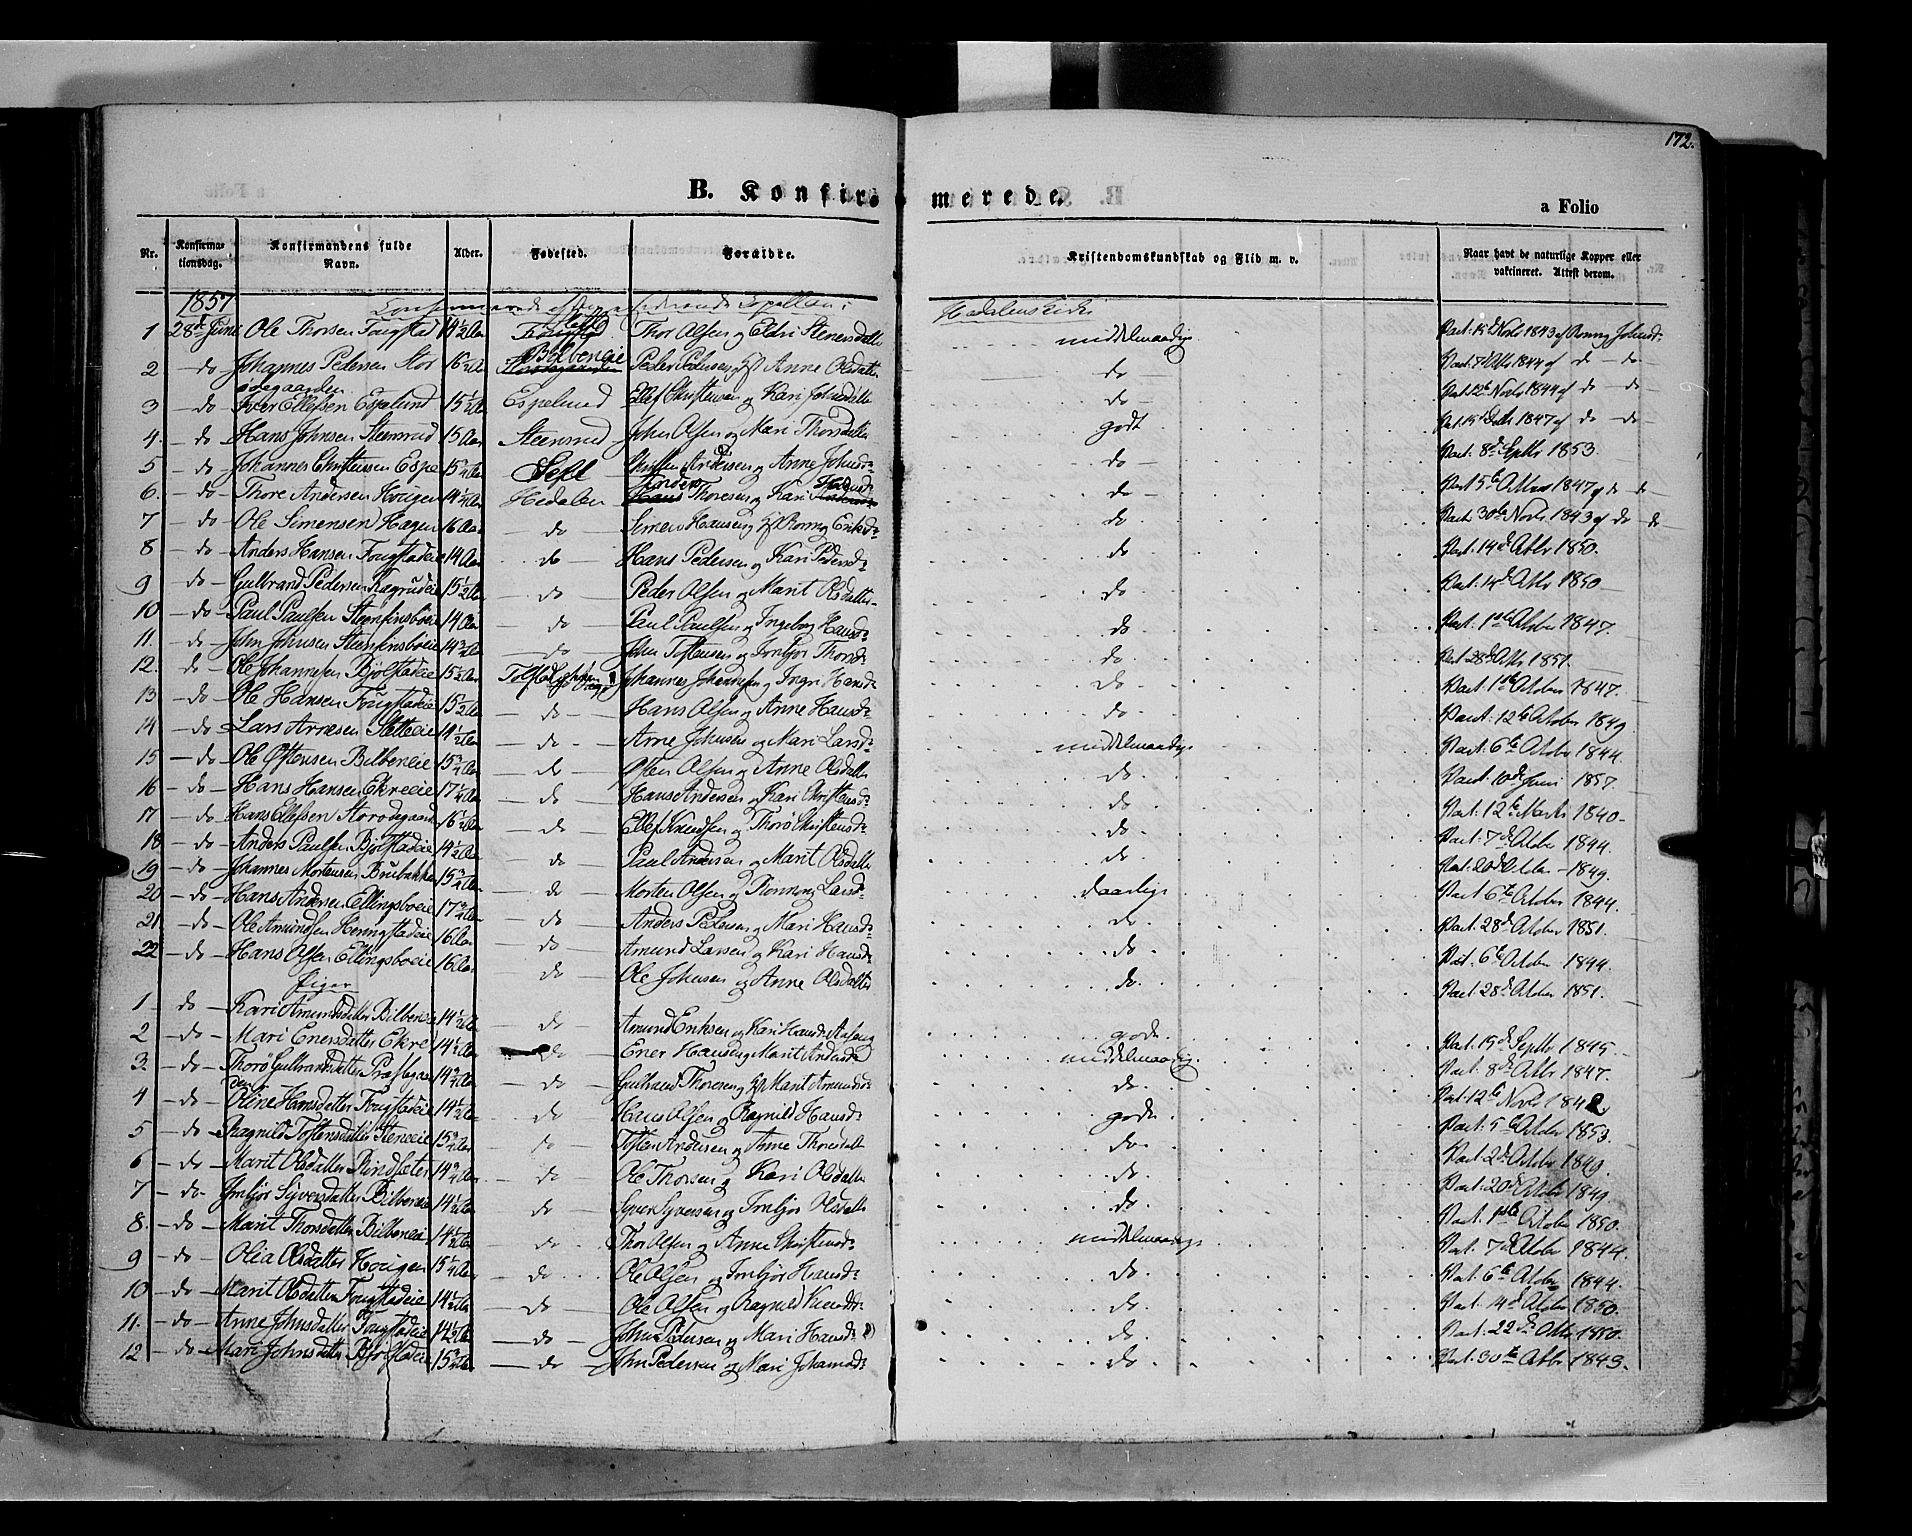 SAH, Vågå prestekontor, Ministerialbok nr. 6 /1, 1856-1872, s. 172